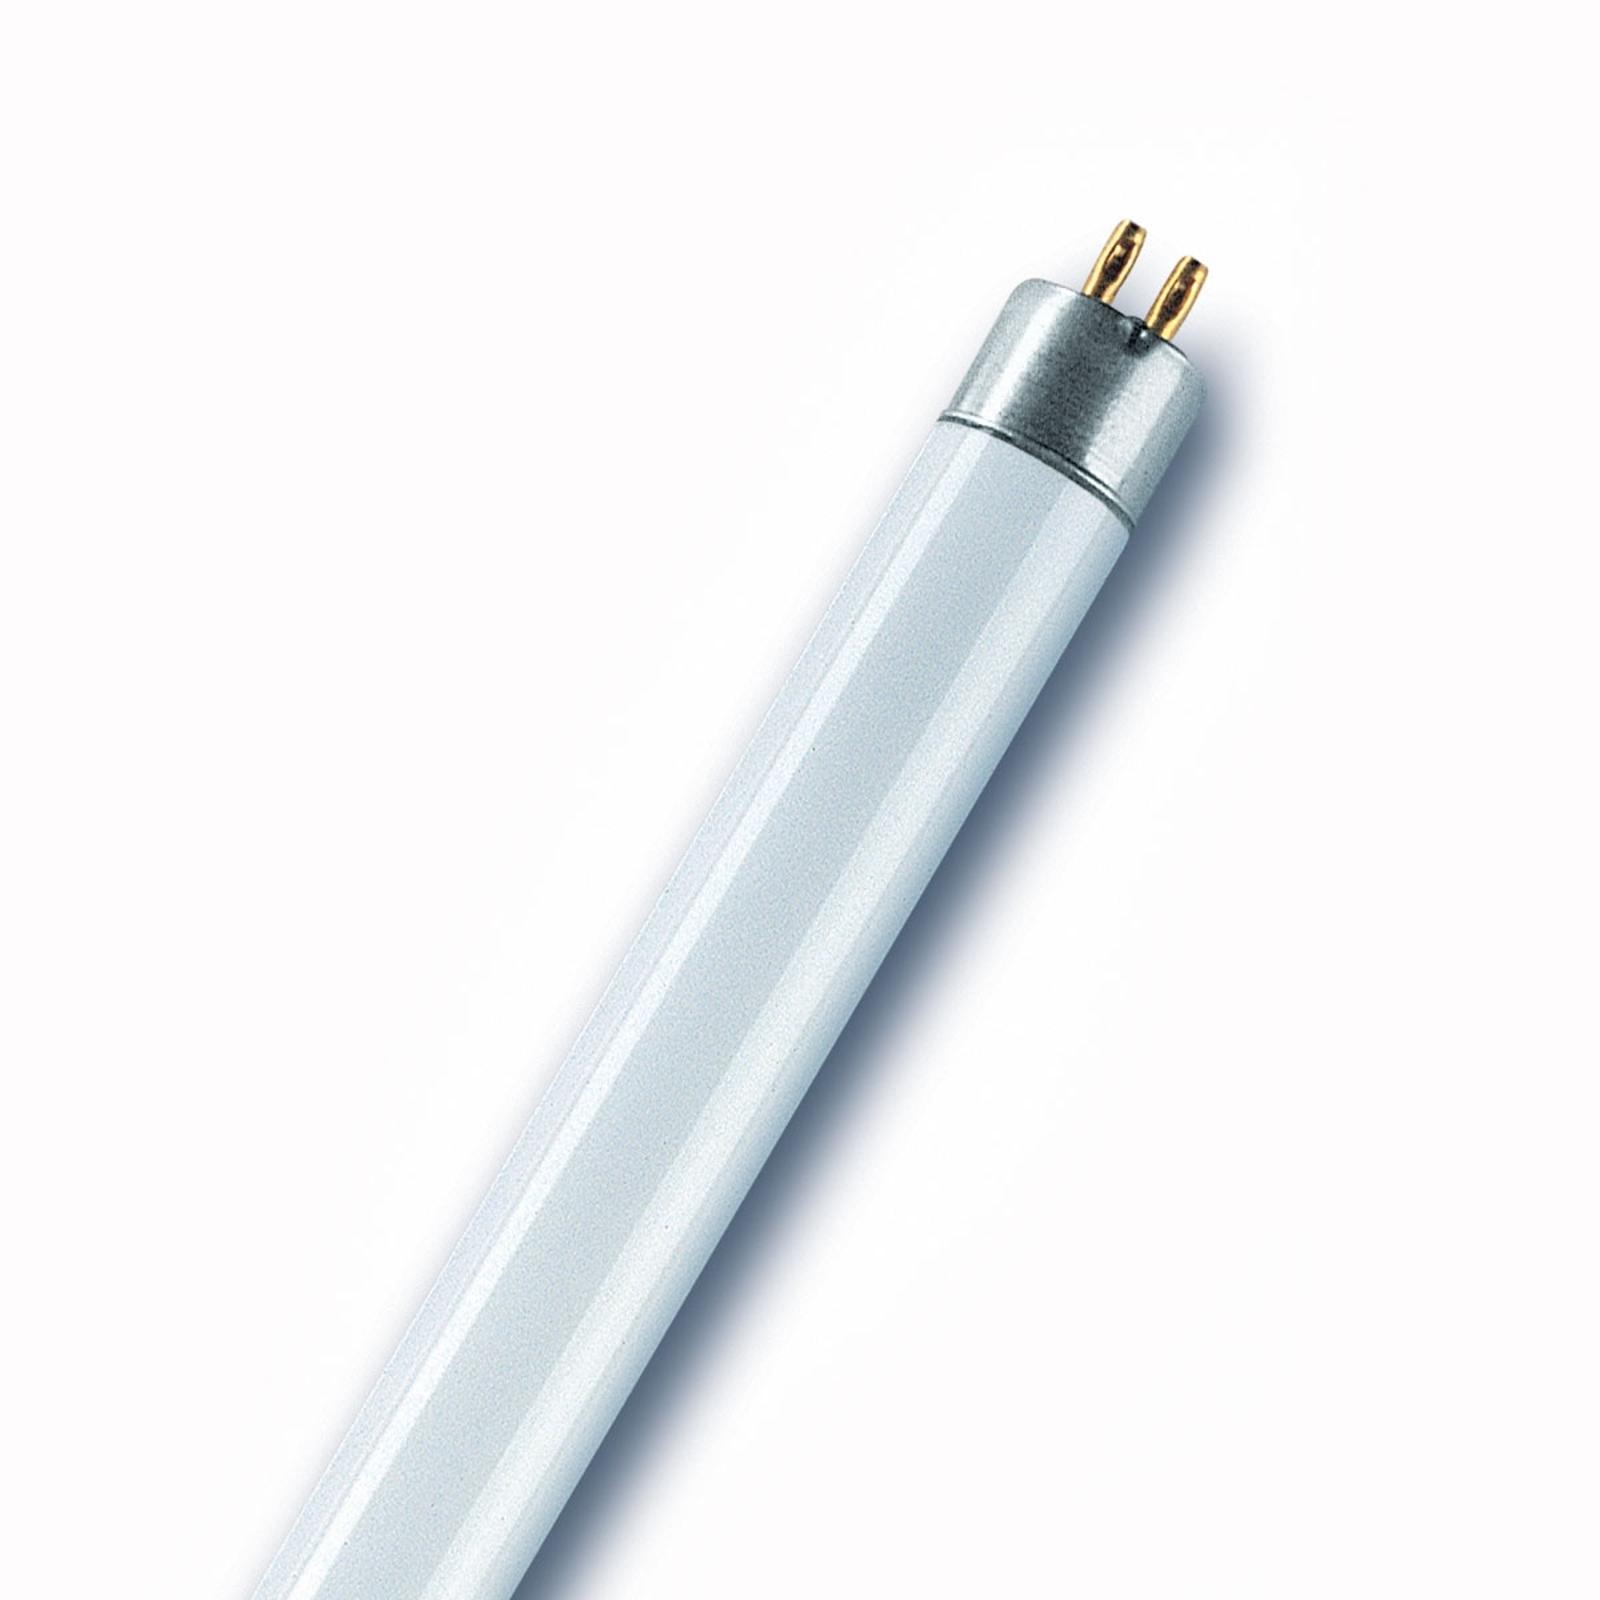 Leuchtstoffröhre G5 T5 54W 830 Lumilux HO